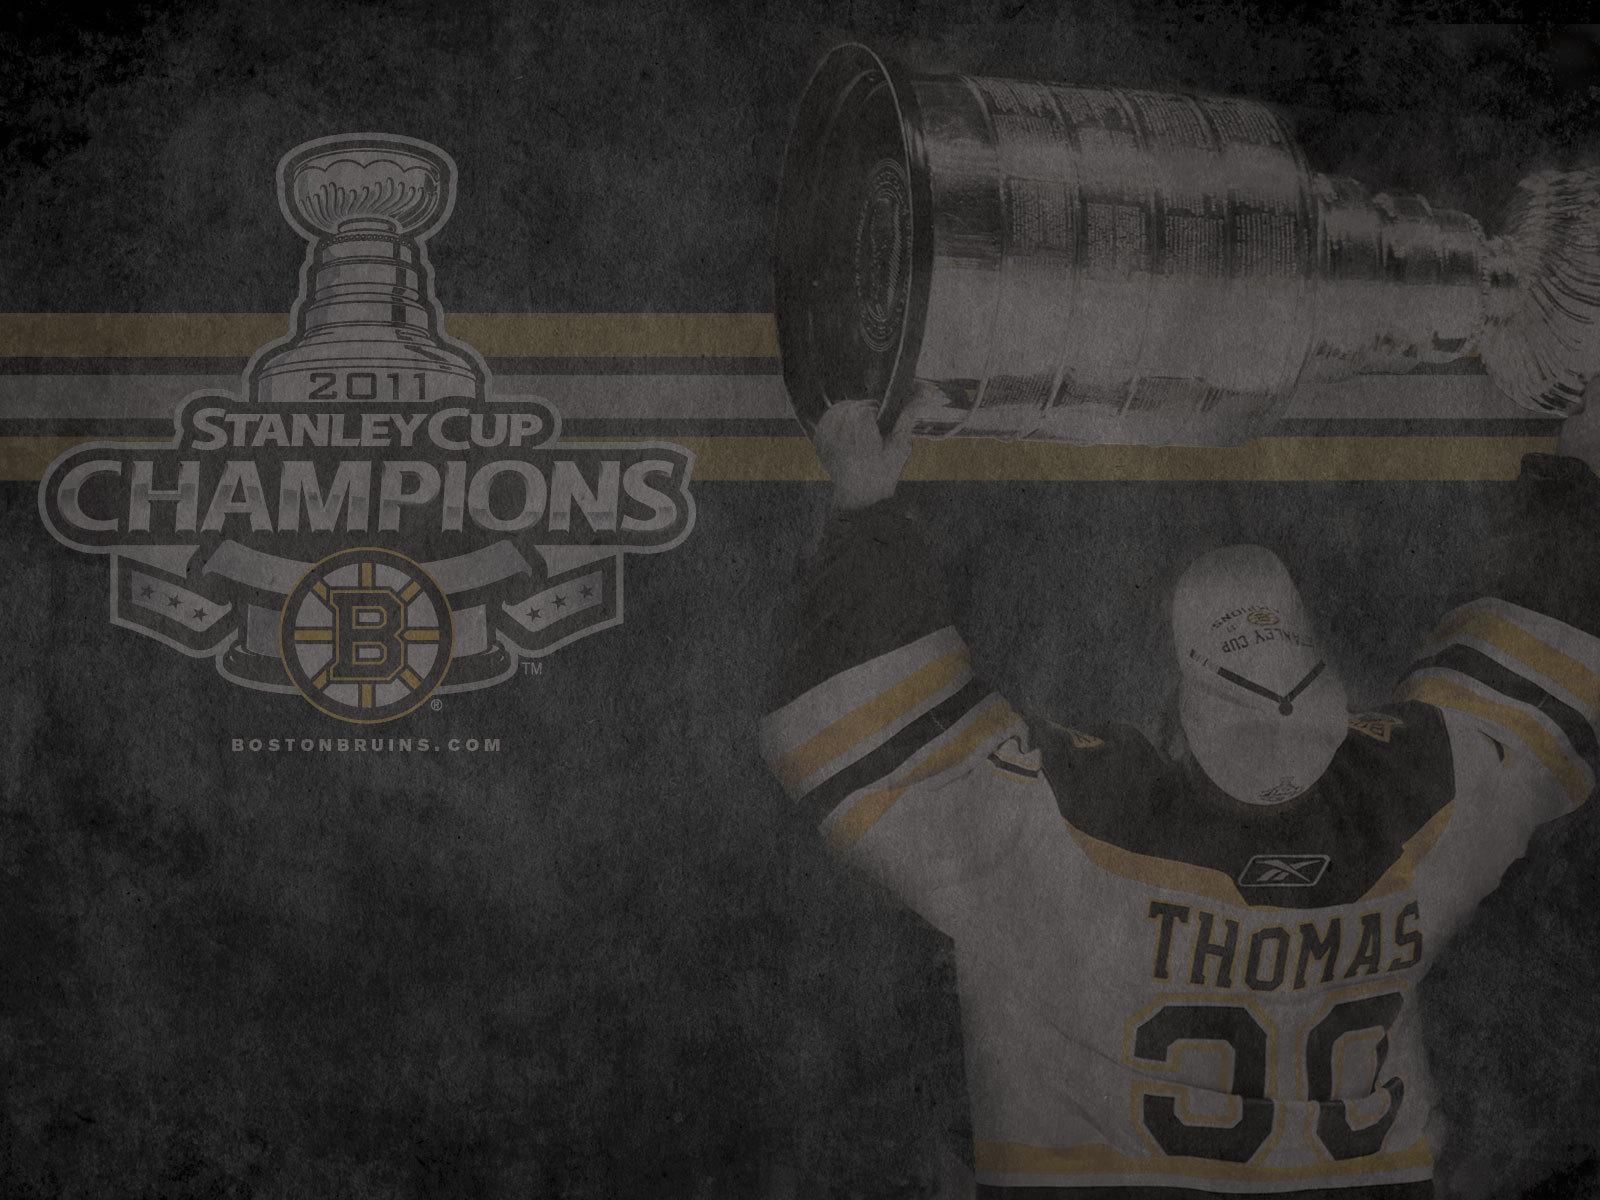 Stanley Cup Champions: Tim Thomas